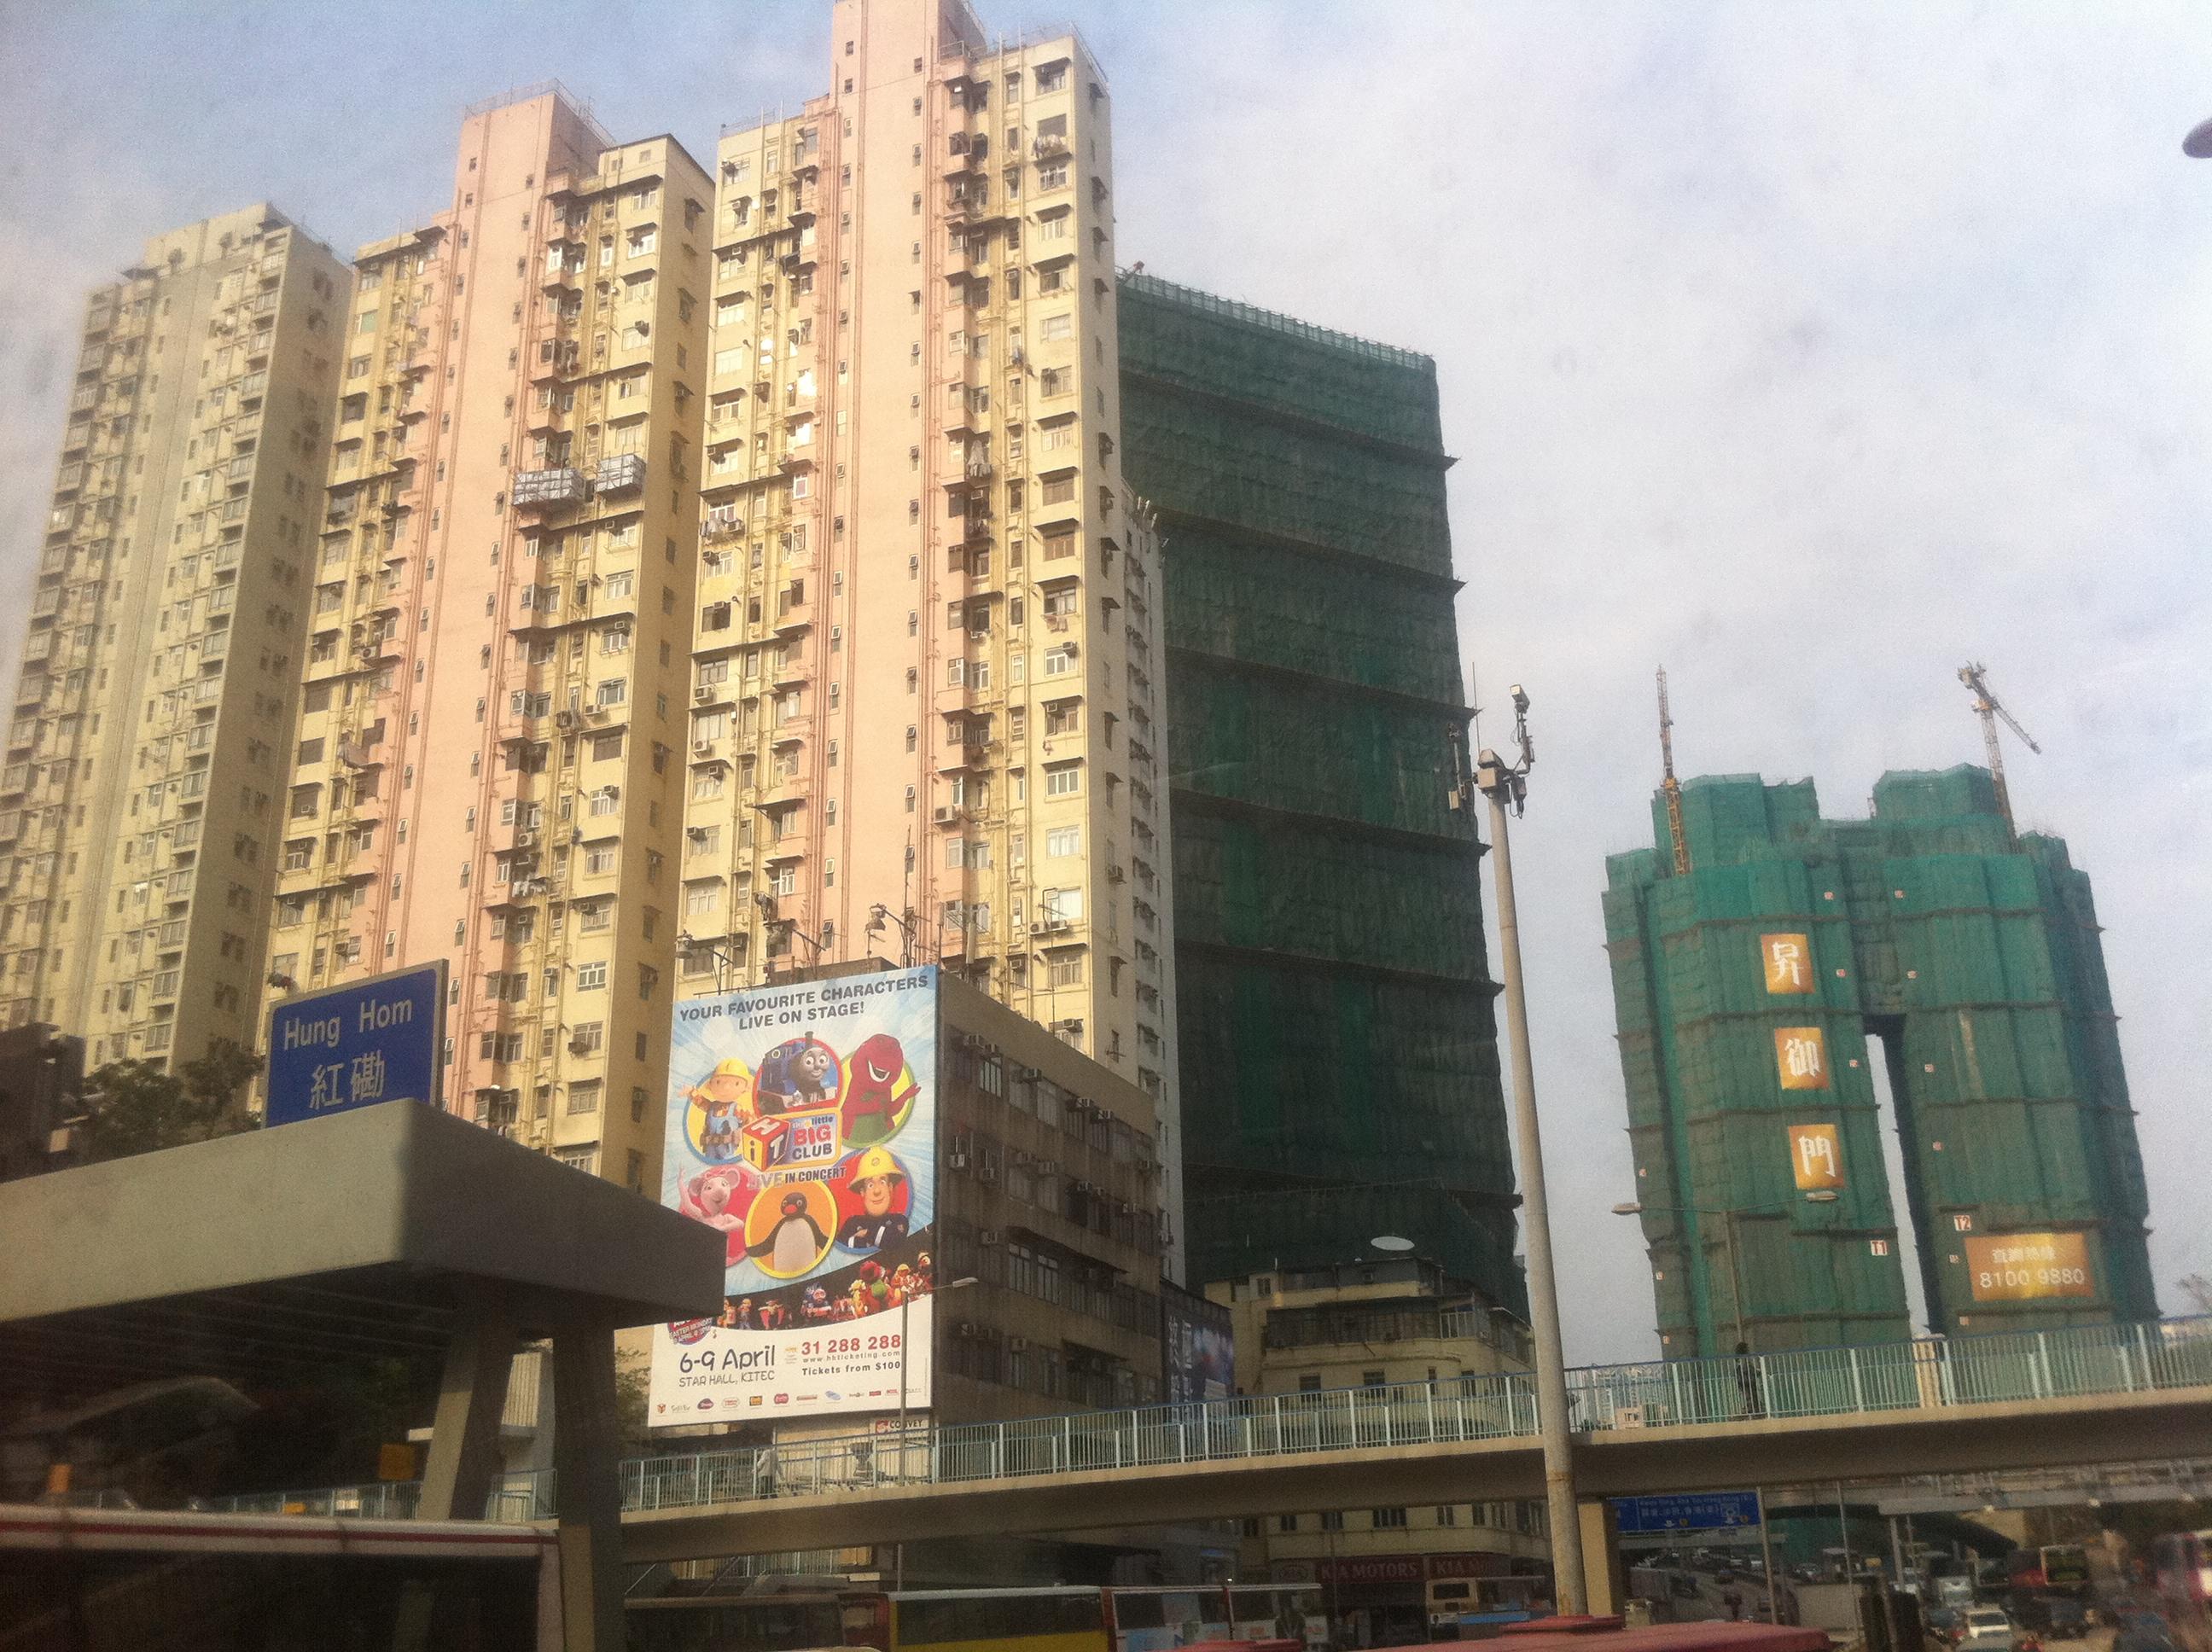 Description hk chatham road chatham gate 蔚景樓 wei king building